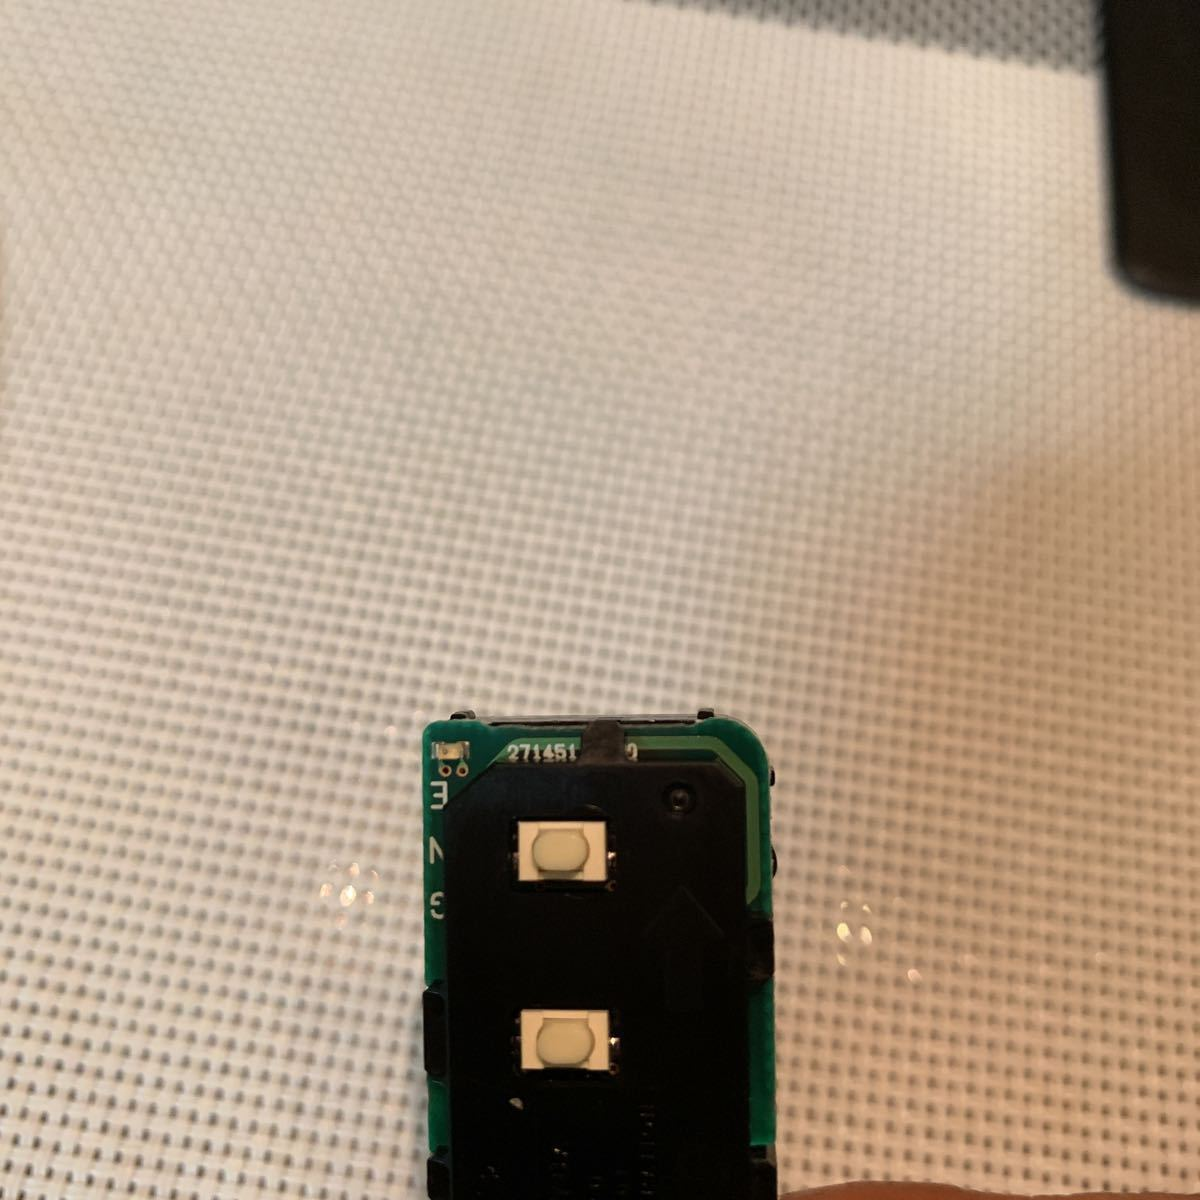 RX450h ハイブリッド GYL-10W 24年後期 スマートキー カードキー セット 箱付き 送料込_画像4